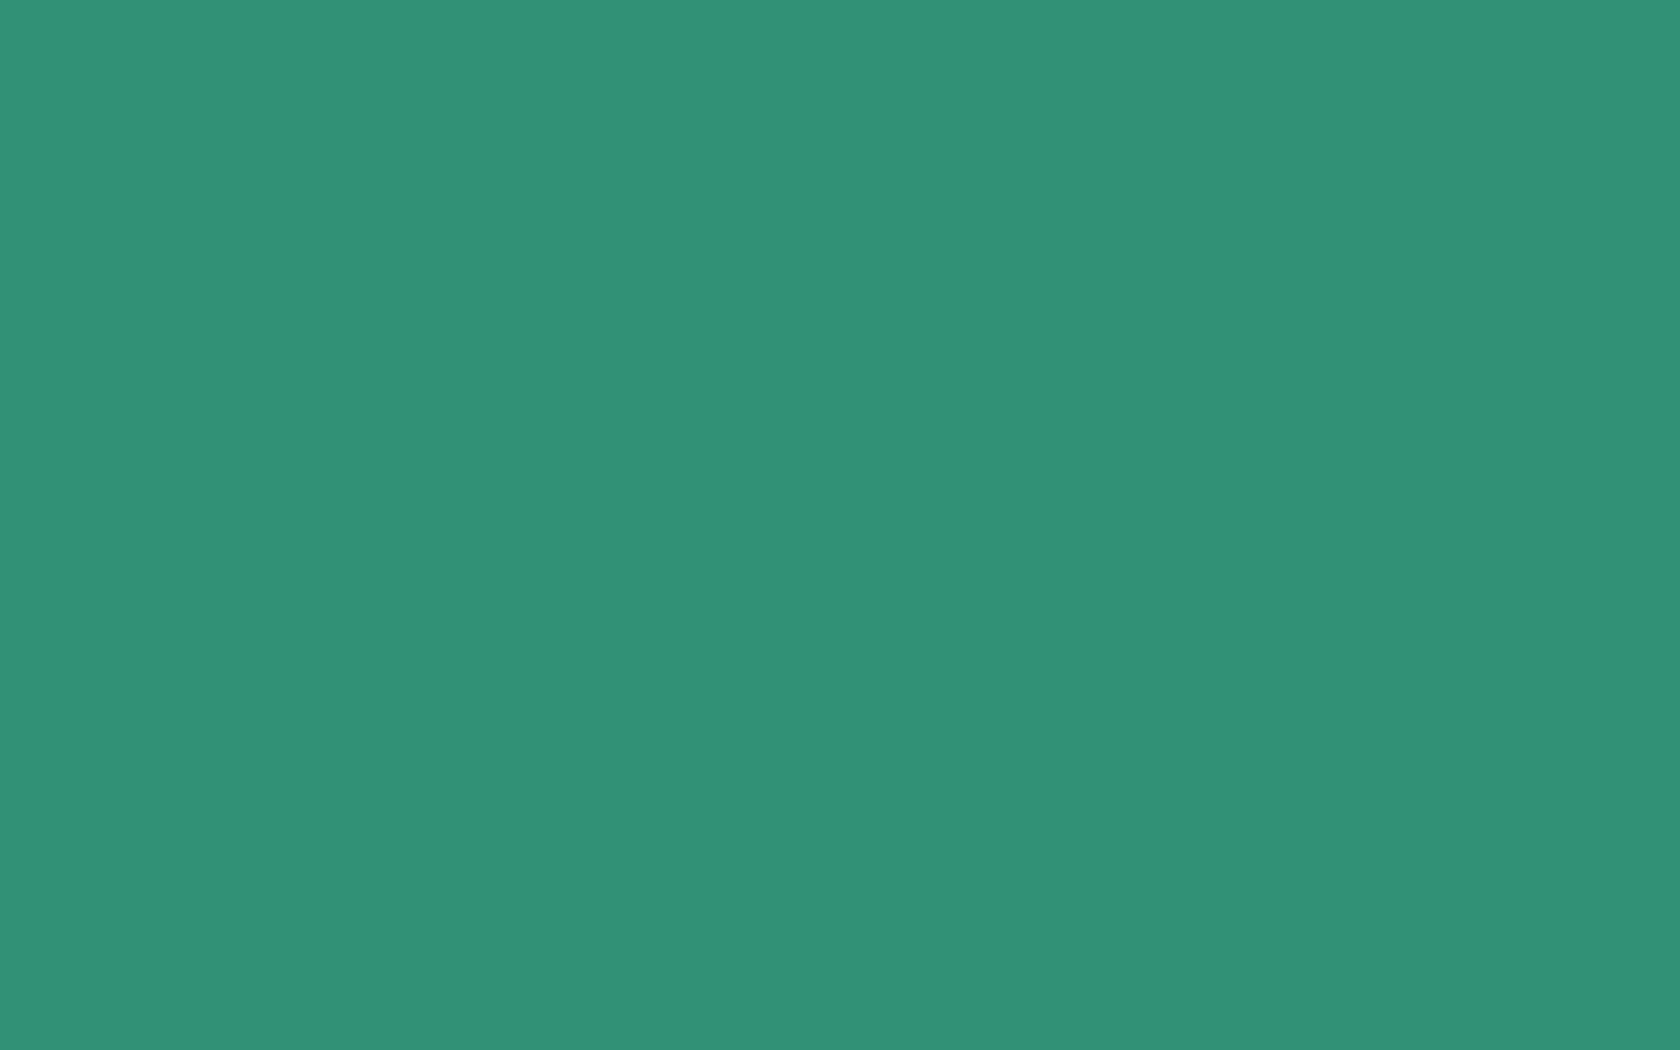 1680x1050 Illuminating Emerald Solid Color Background